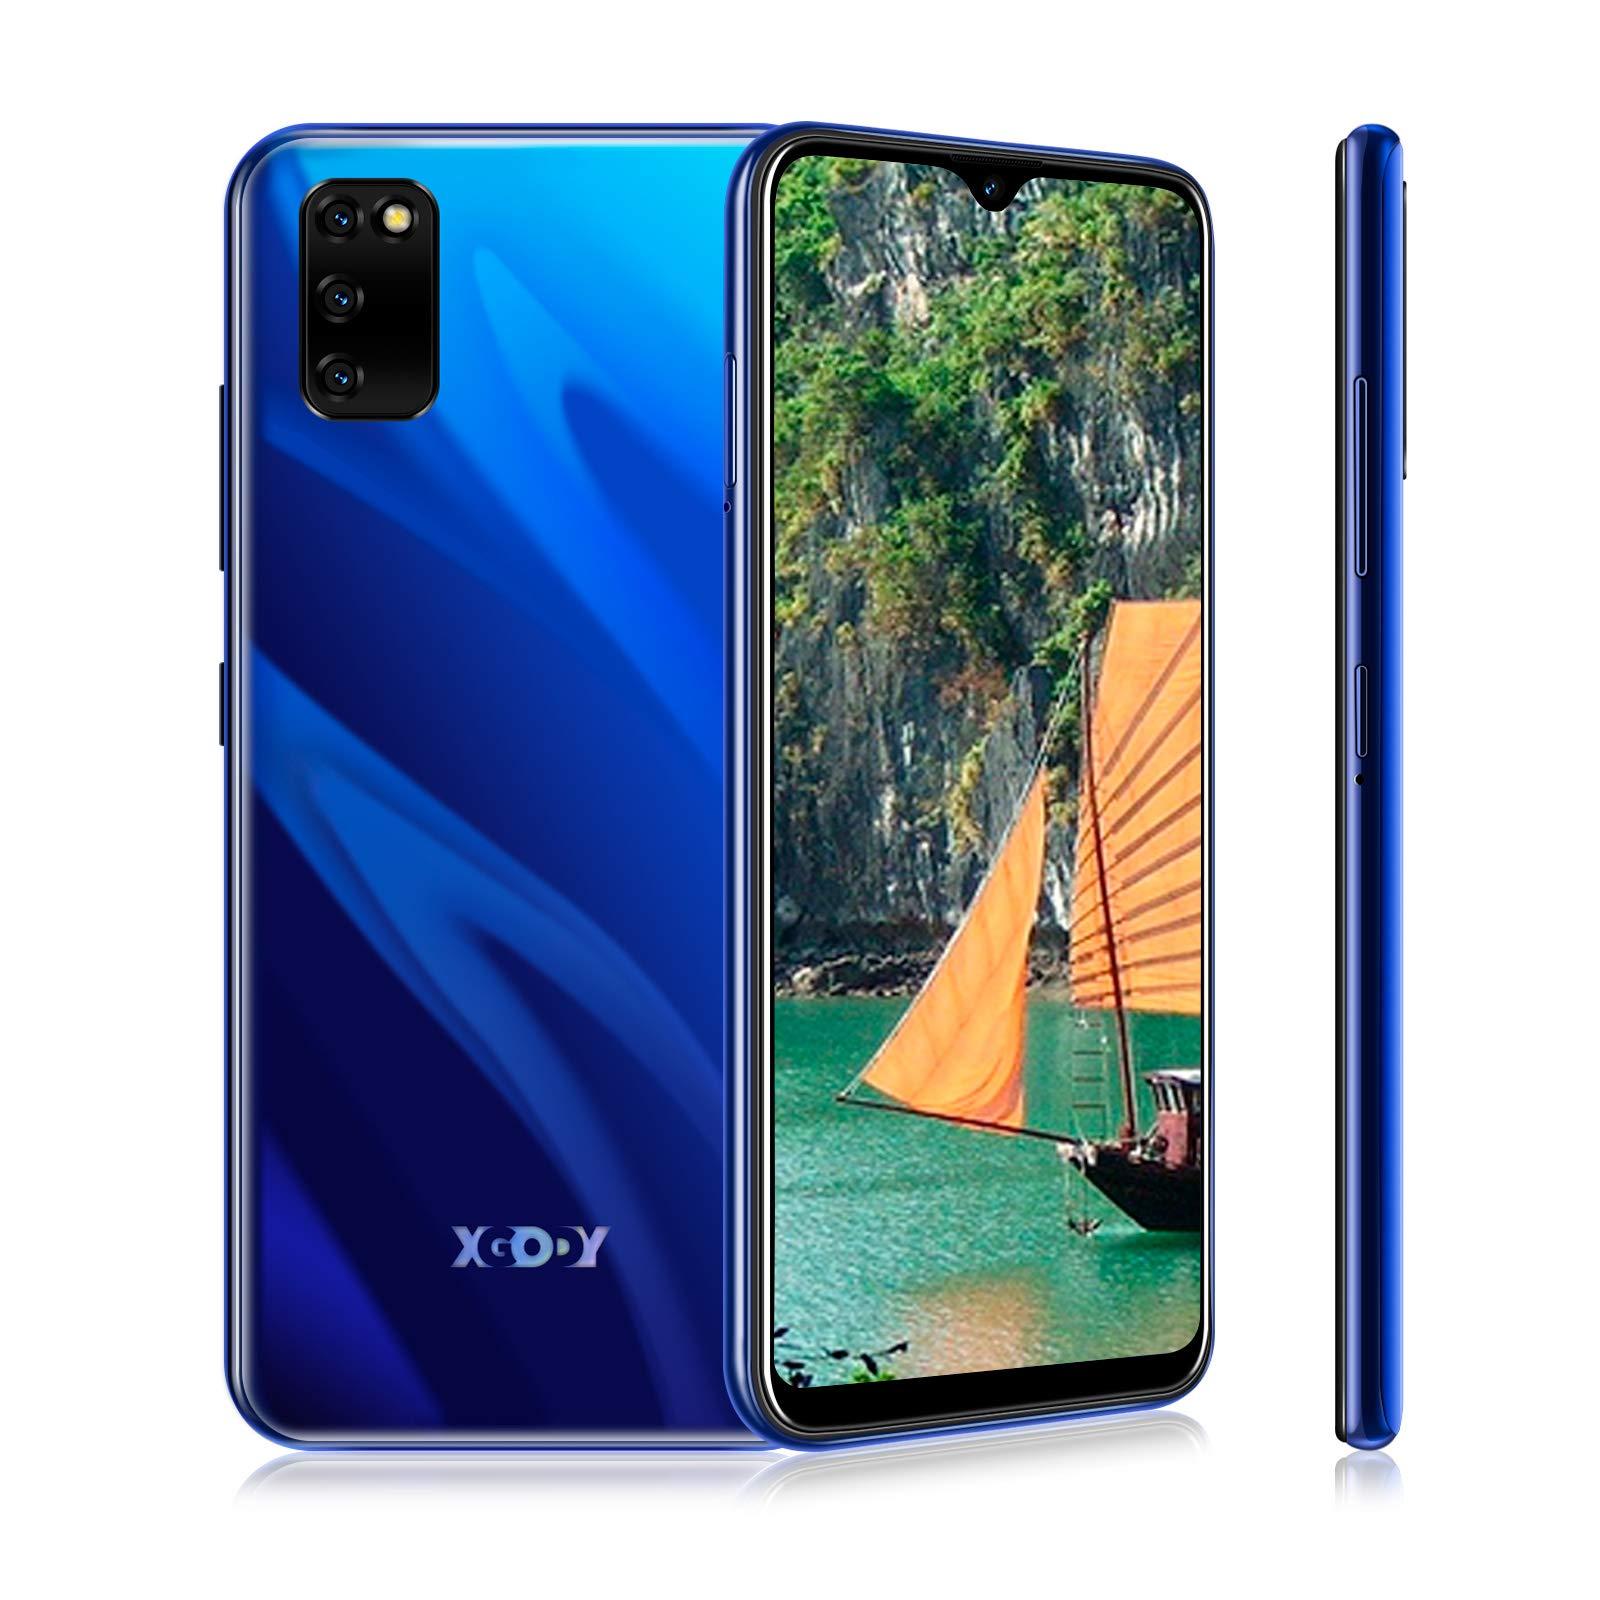 XGODY M30S Android 9.0 Smartphone 6.3'' 32GB 3GB Dual SIM 4G Unlocked Cell Phone LTE International use